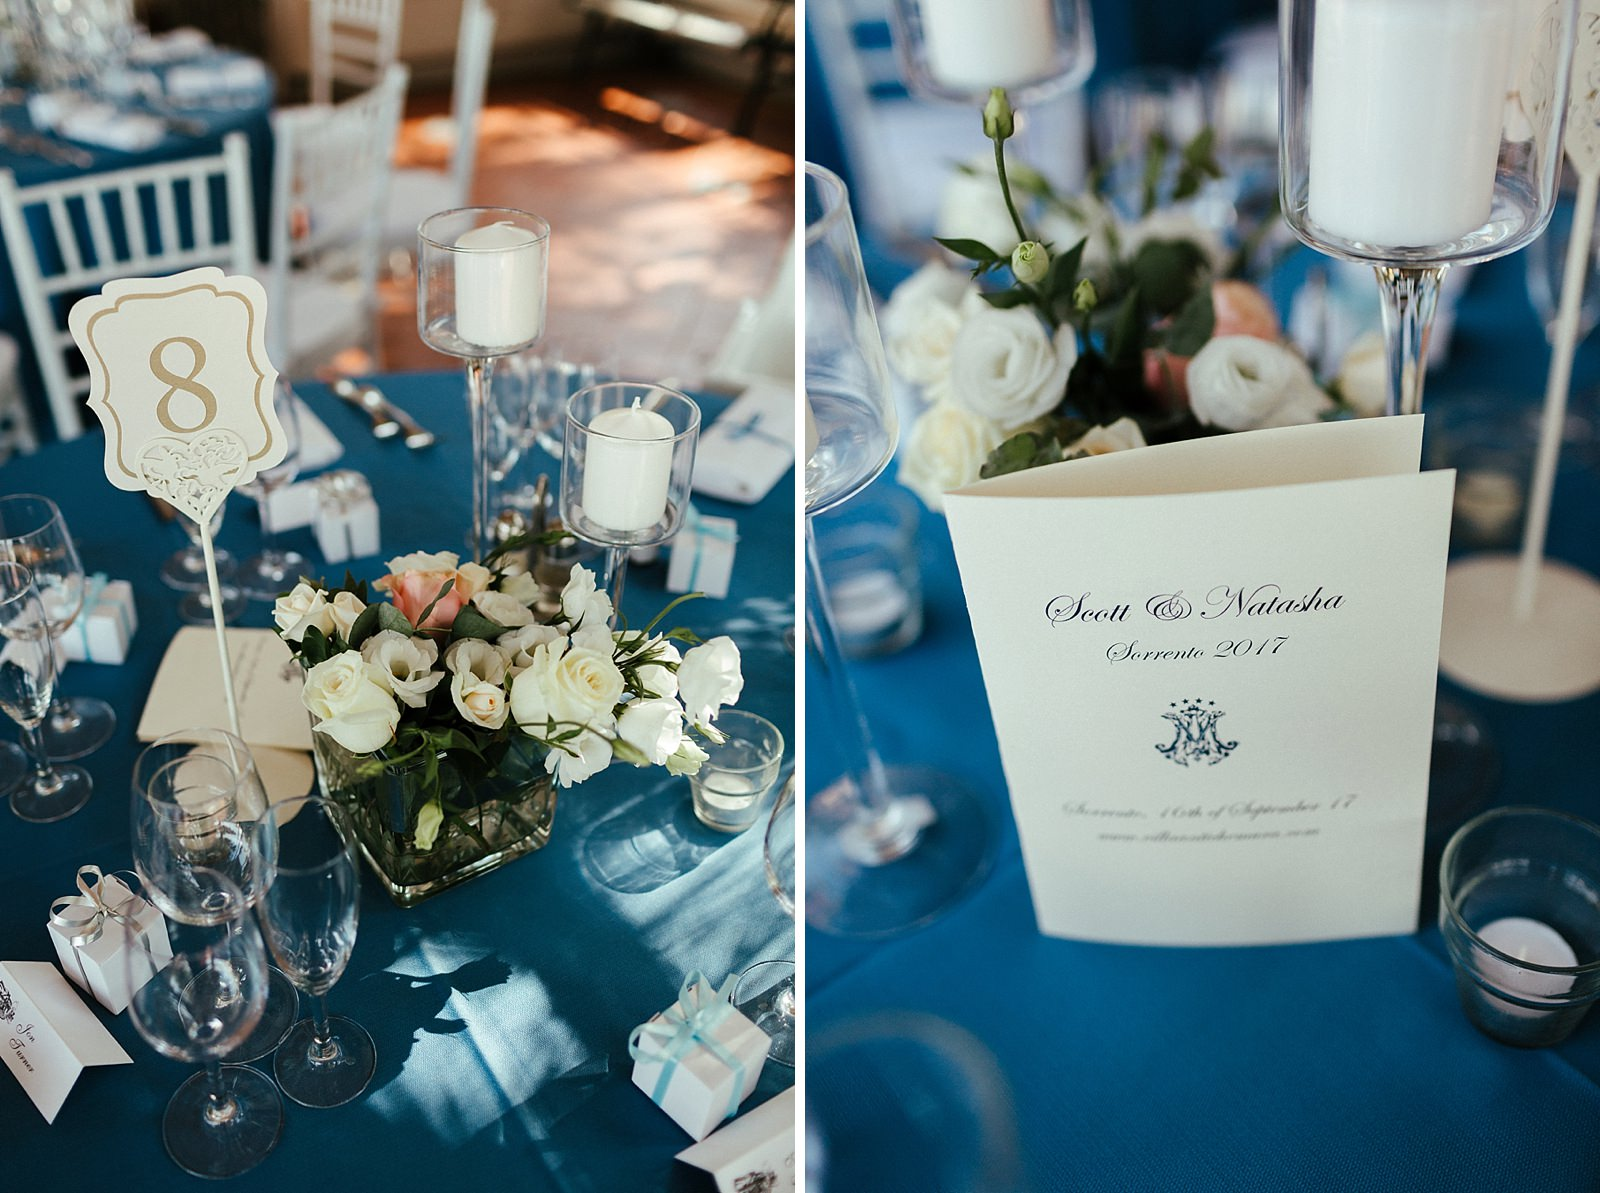 Italian wedding table decorations